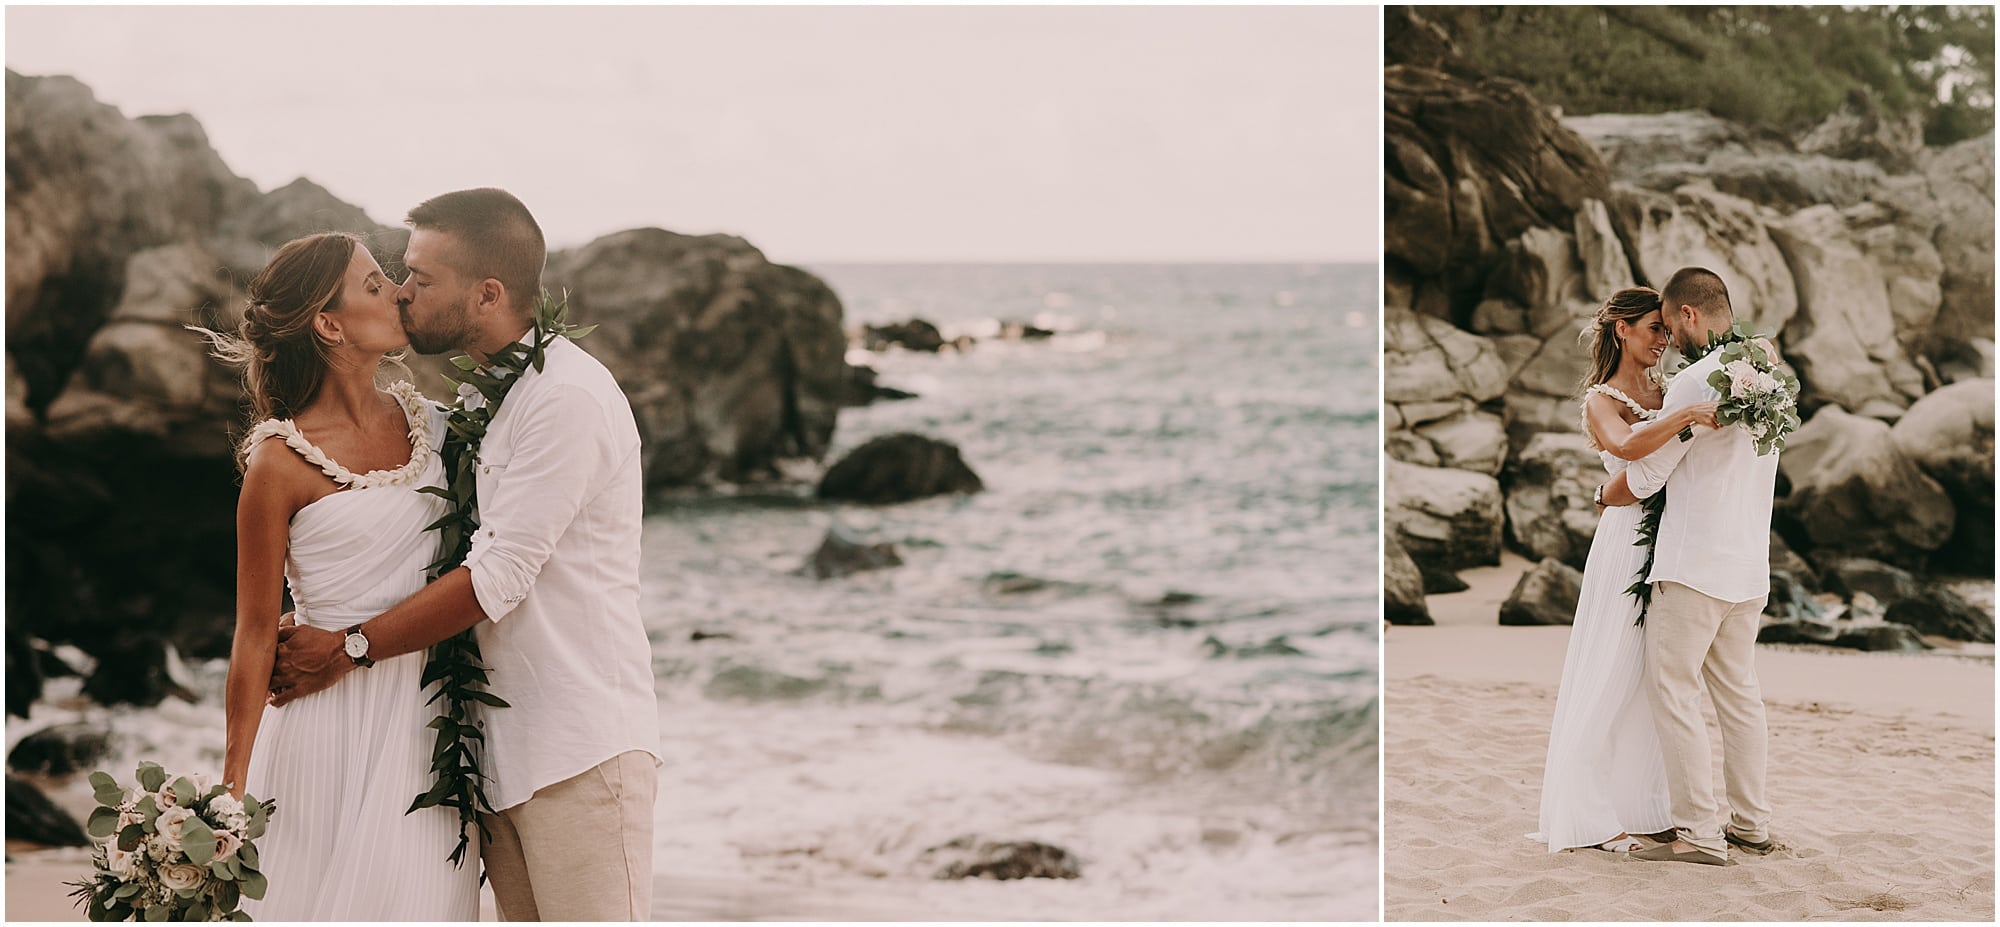 Maui wedding photographer24